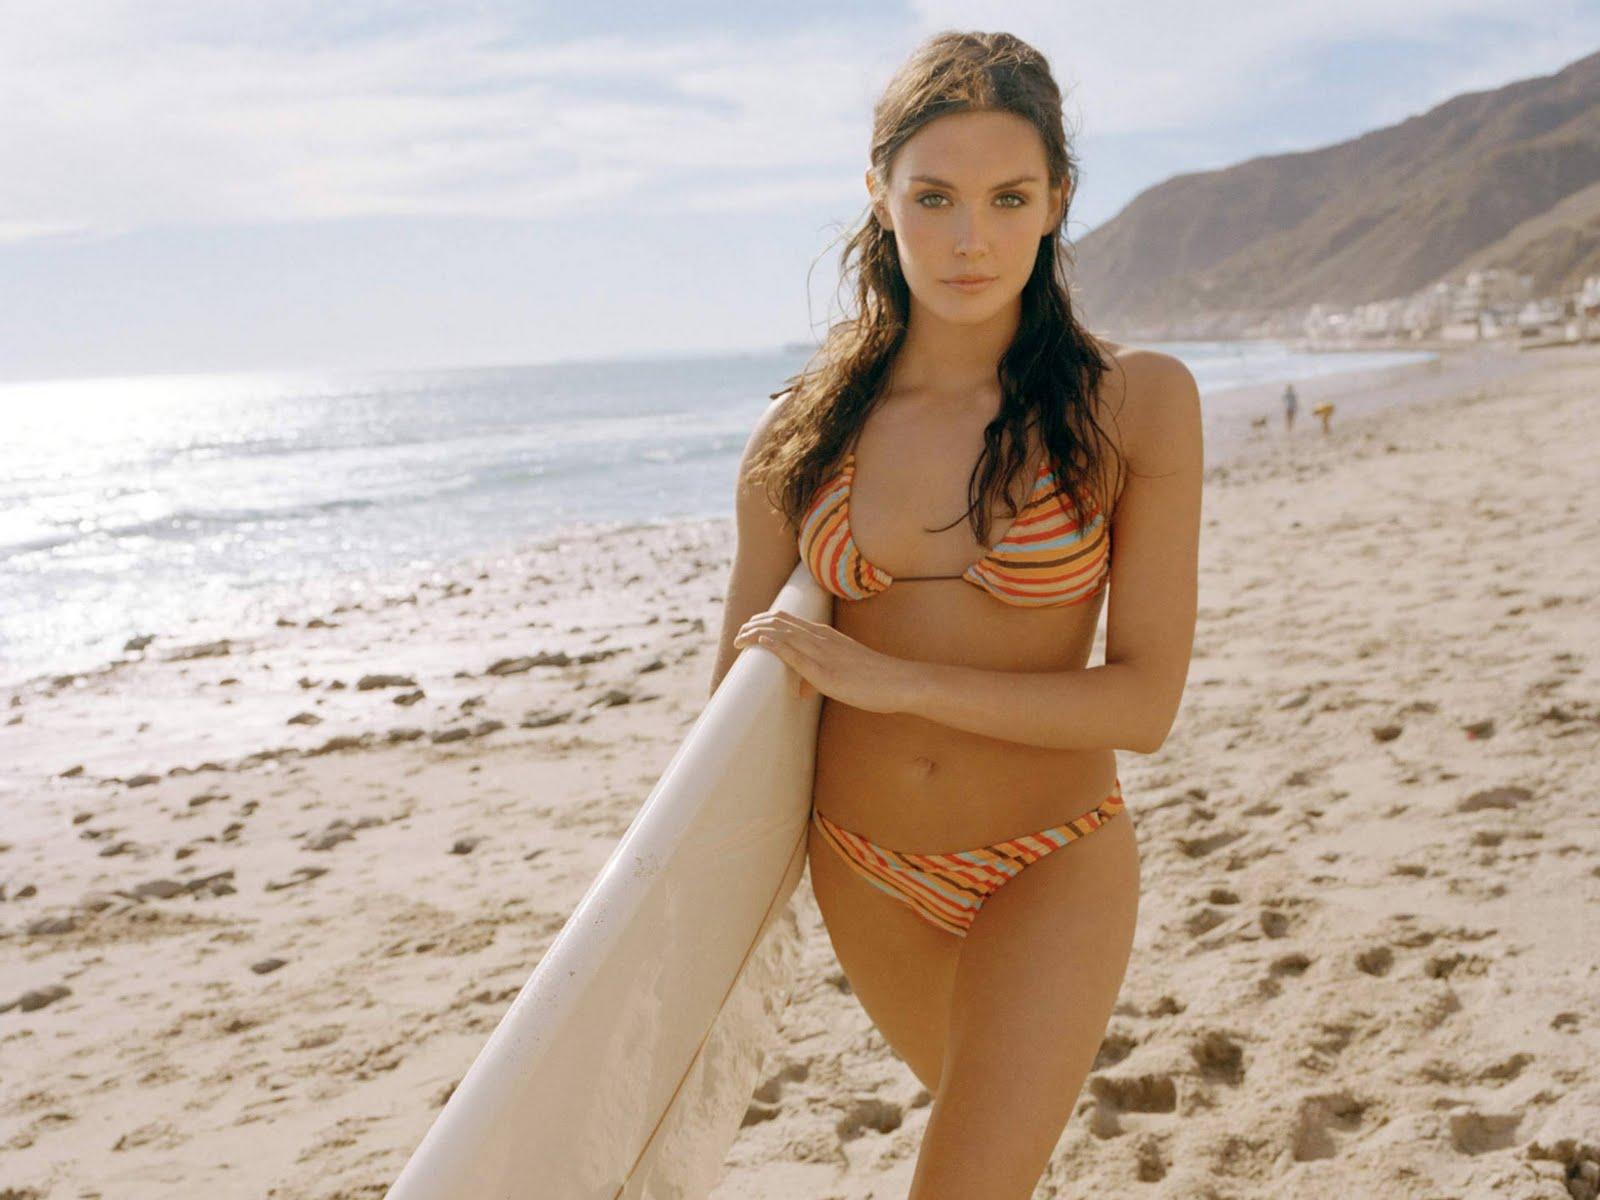 Wallpaper Surfer Girl From Summerland Life West Coast Leo Carrillo State Park Malibu California